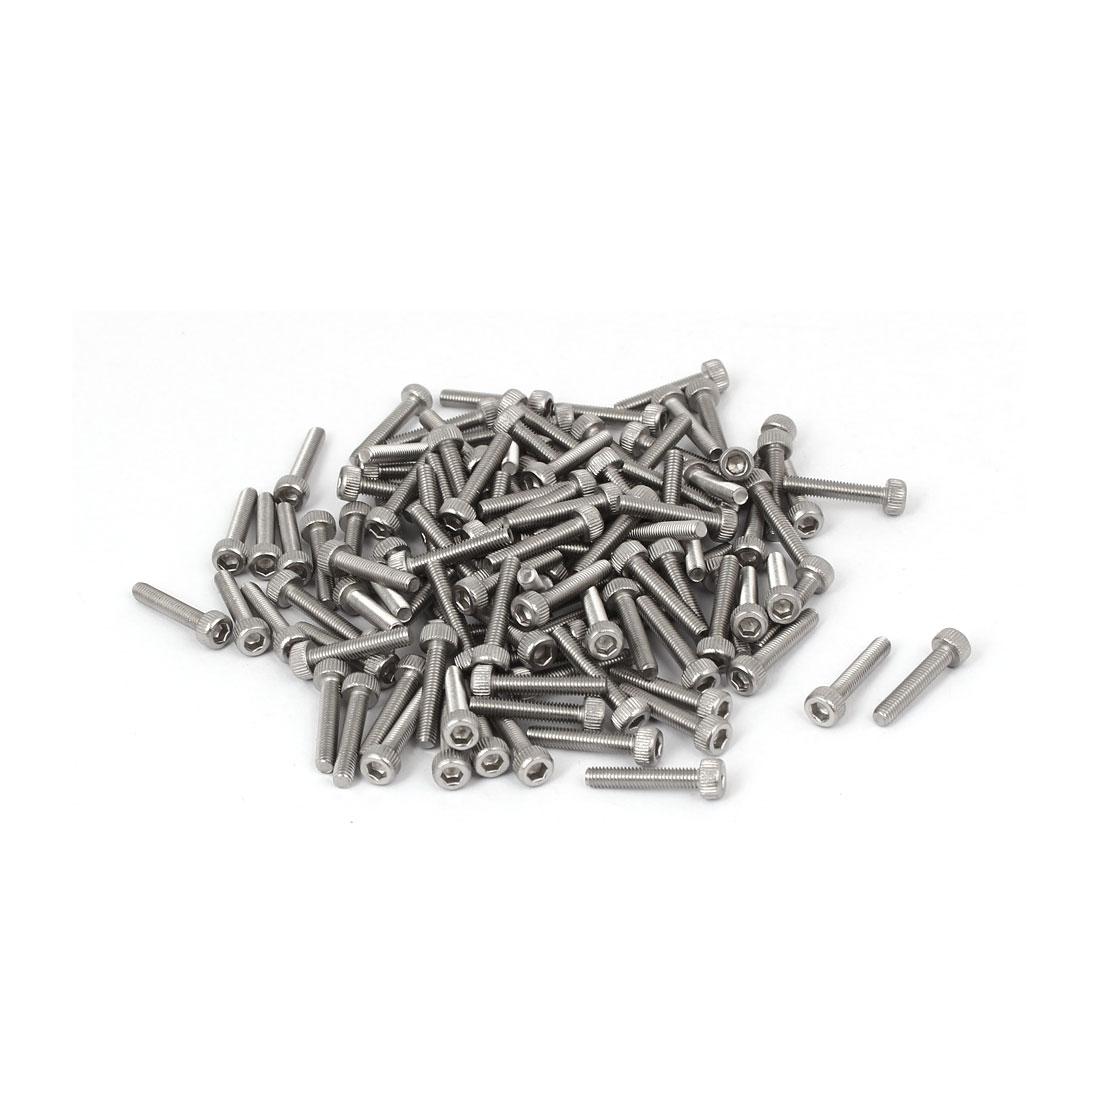 M3x16mm Thread 304 Stainless Steel Hex Socket Head Cap Screw Bolt DIN912 120pcs